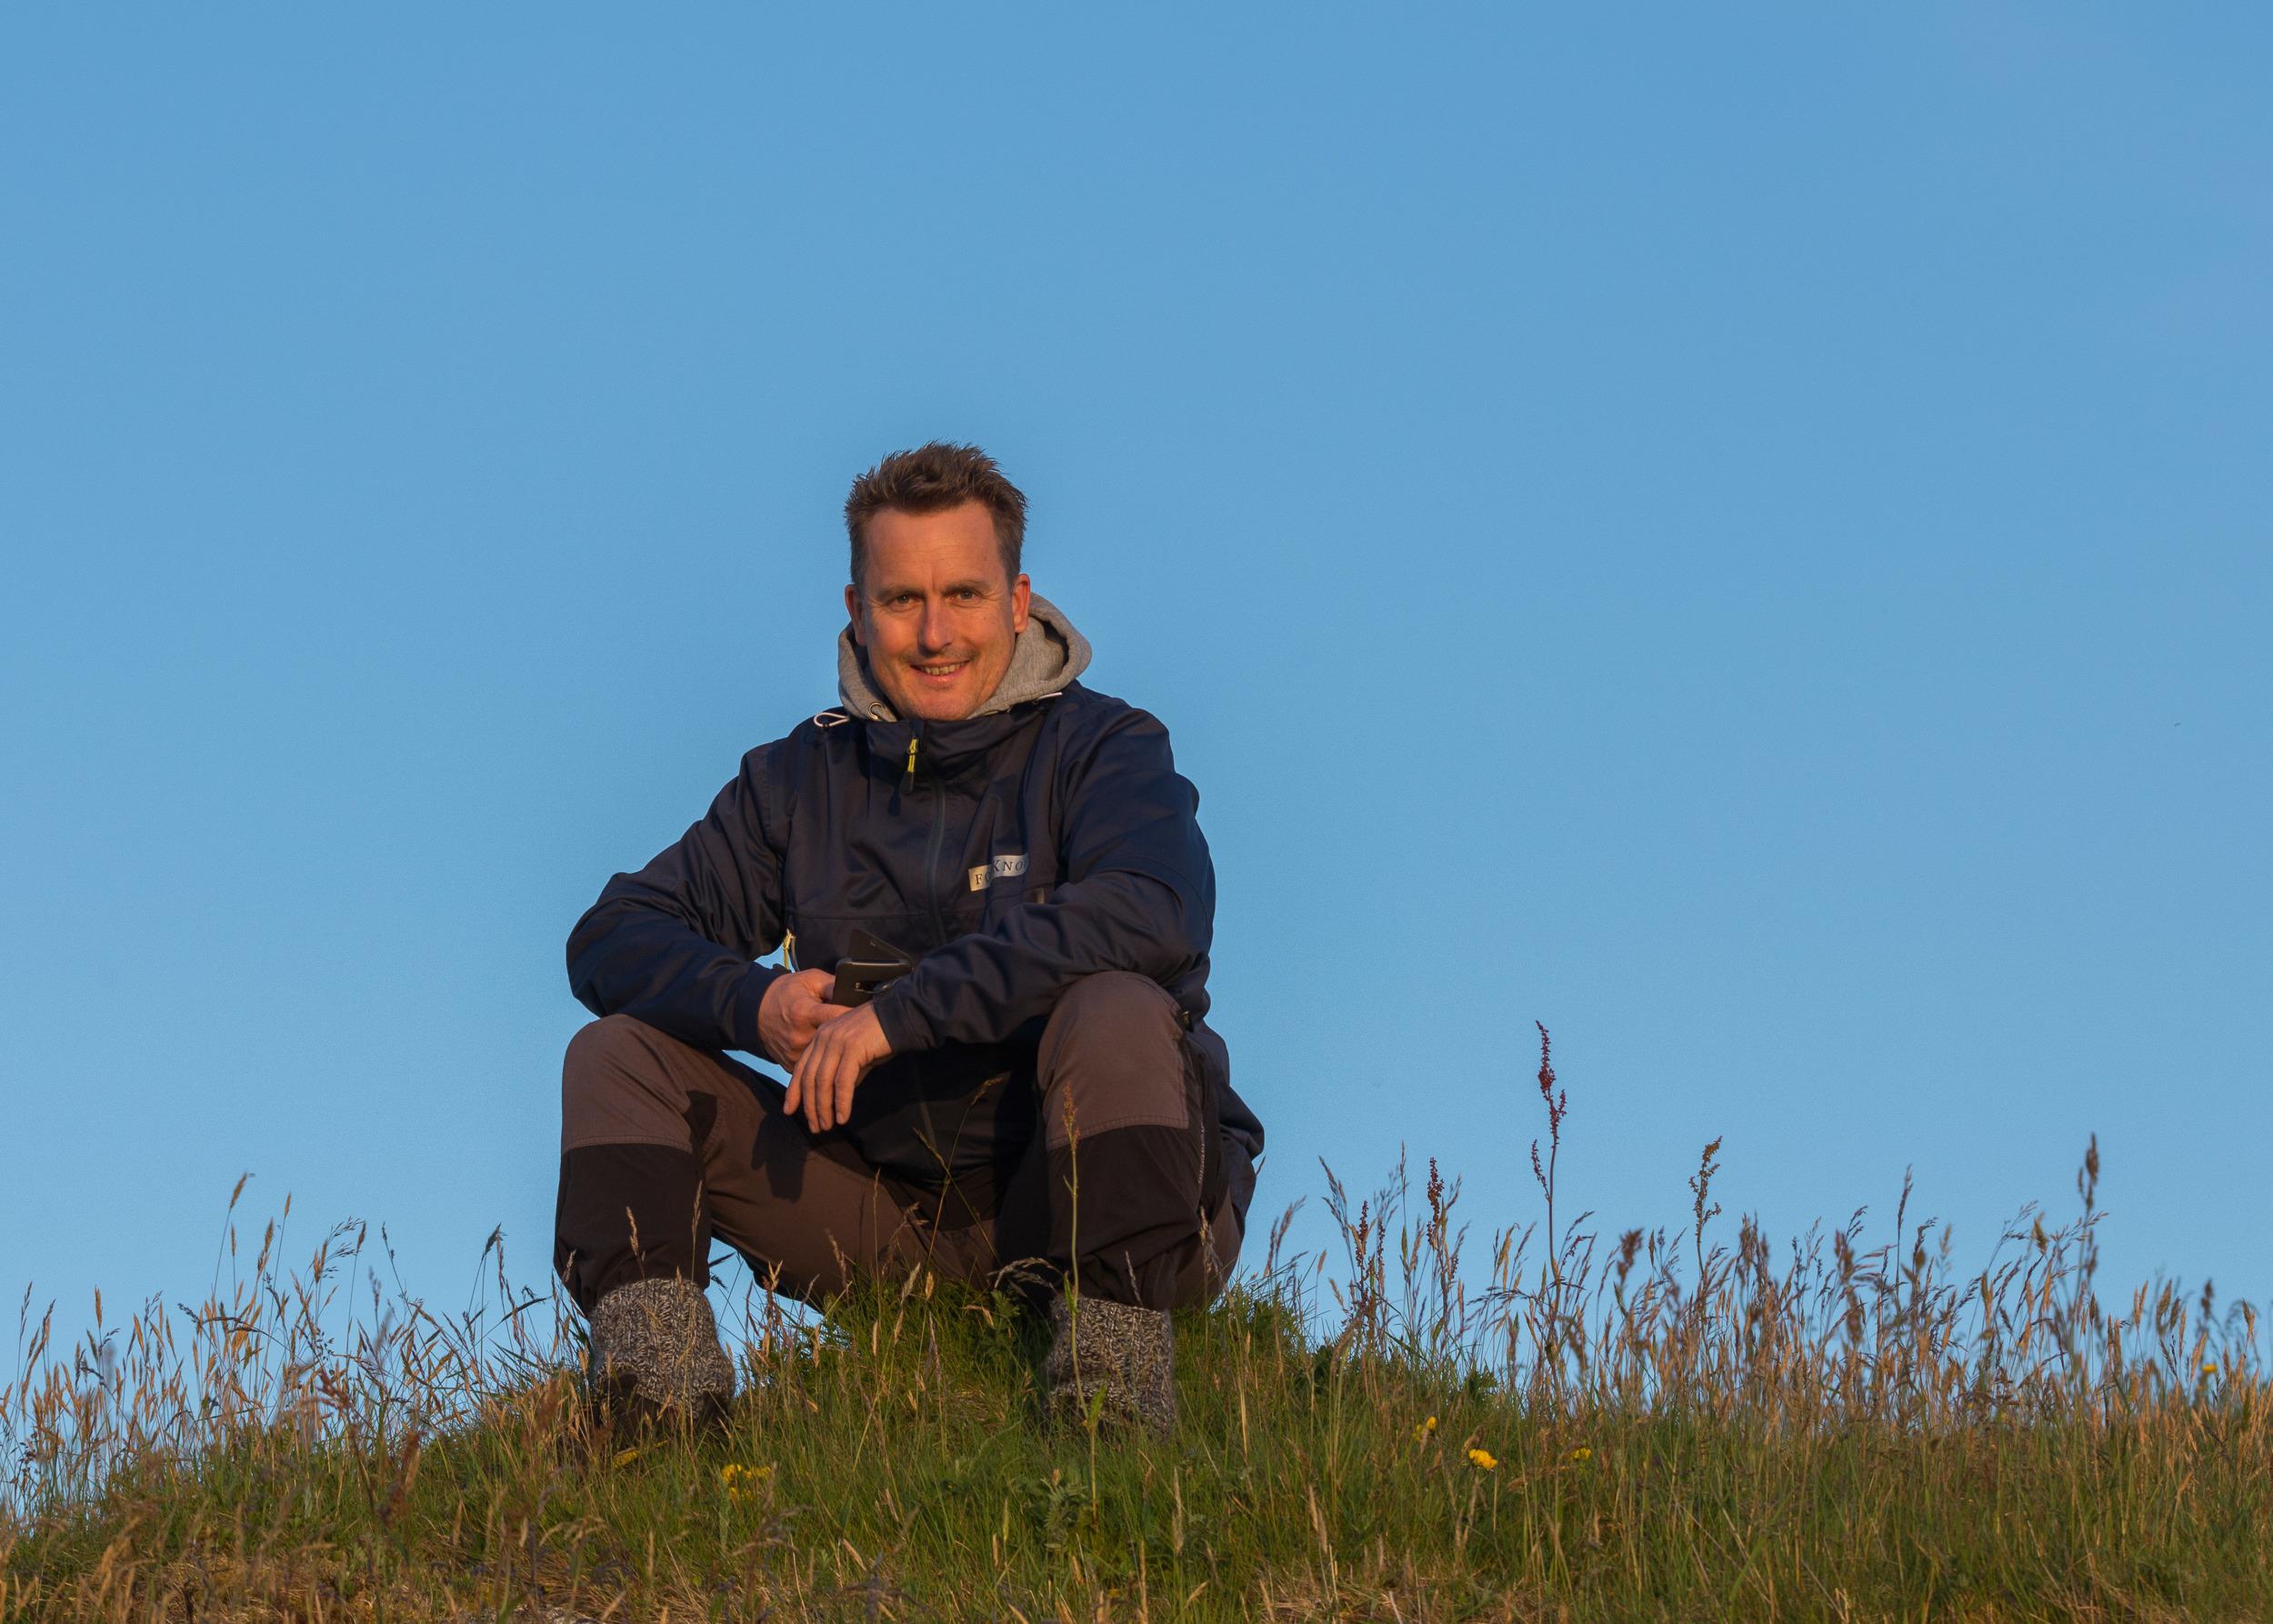 Sven-Erik Knoff